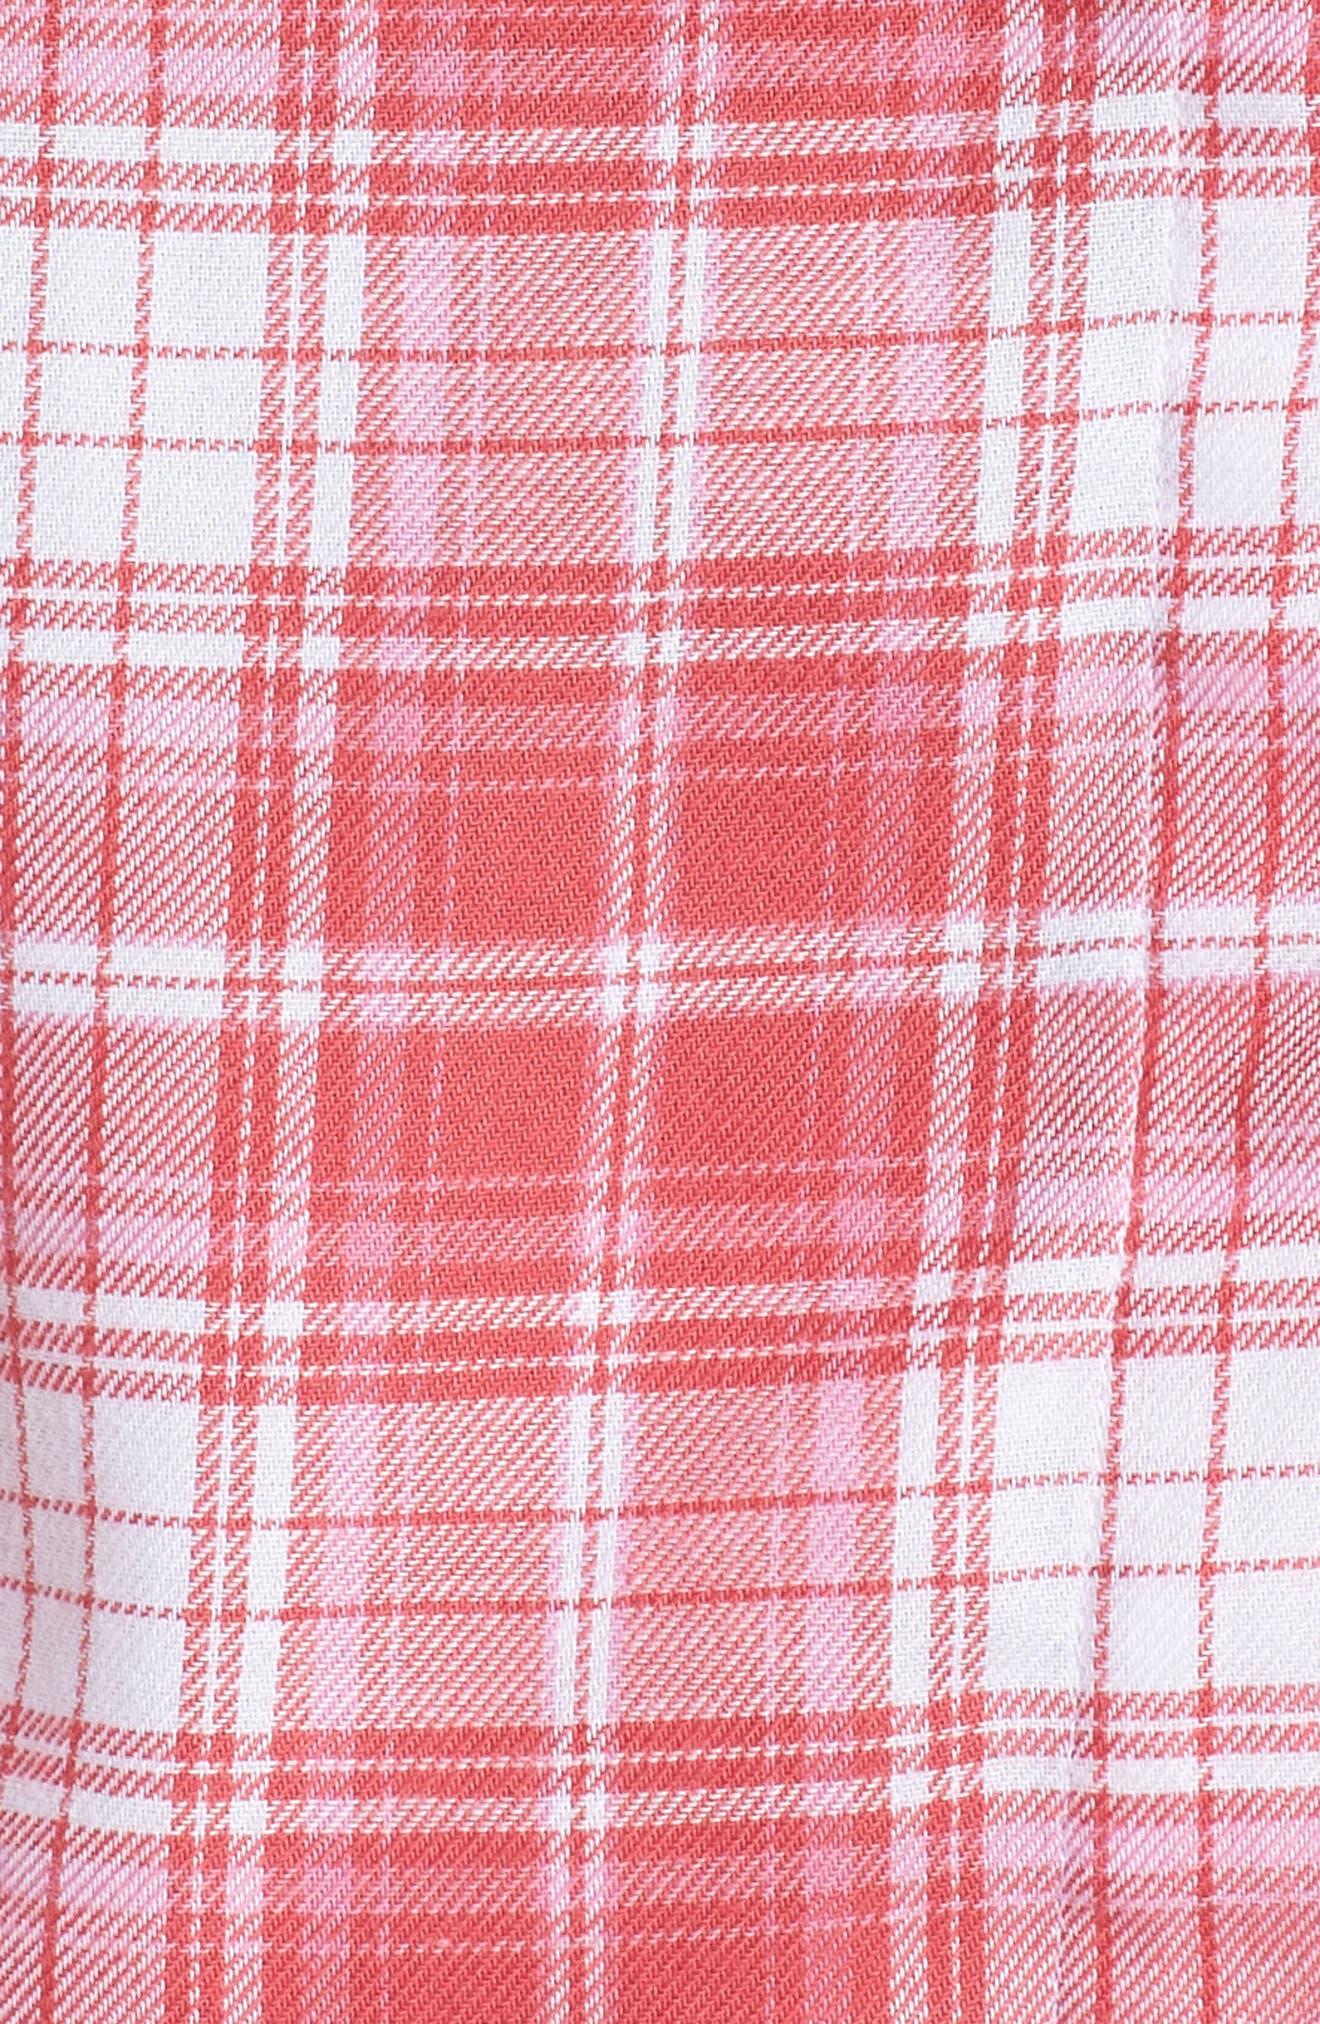 Raven Plaid Pajamas,                             Alternate thumbnail 5, color,                             CLARET RED PLAID